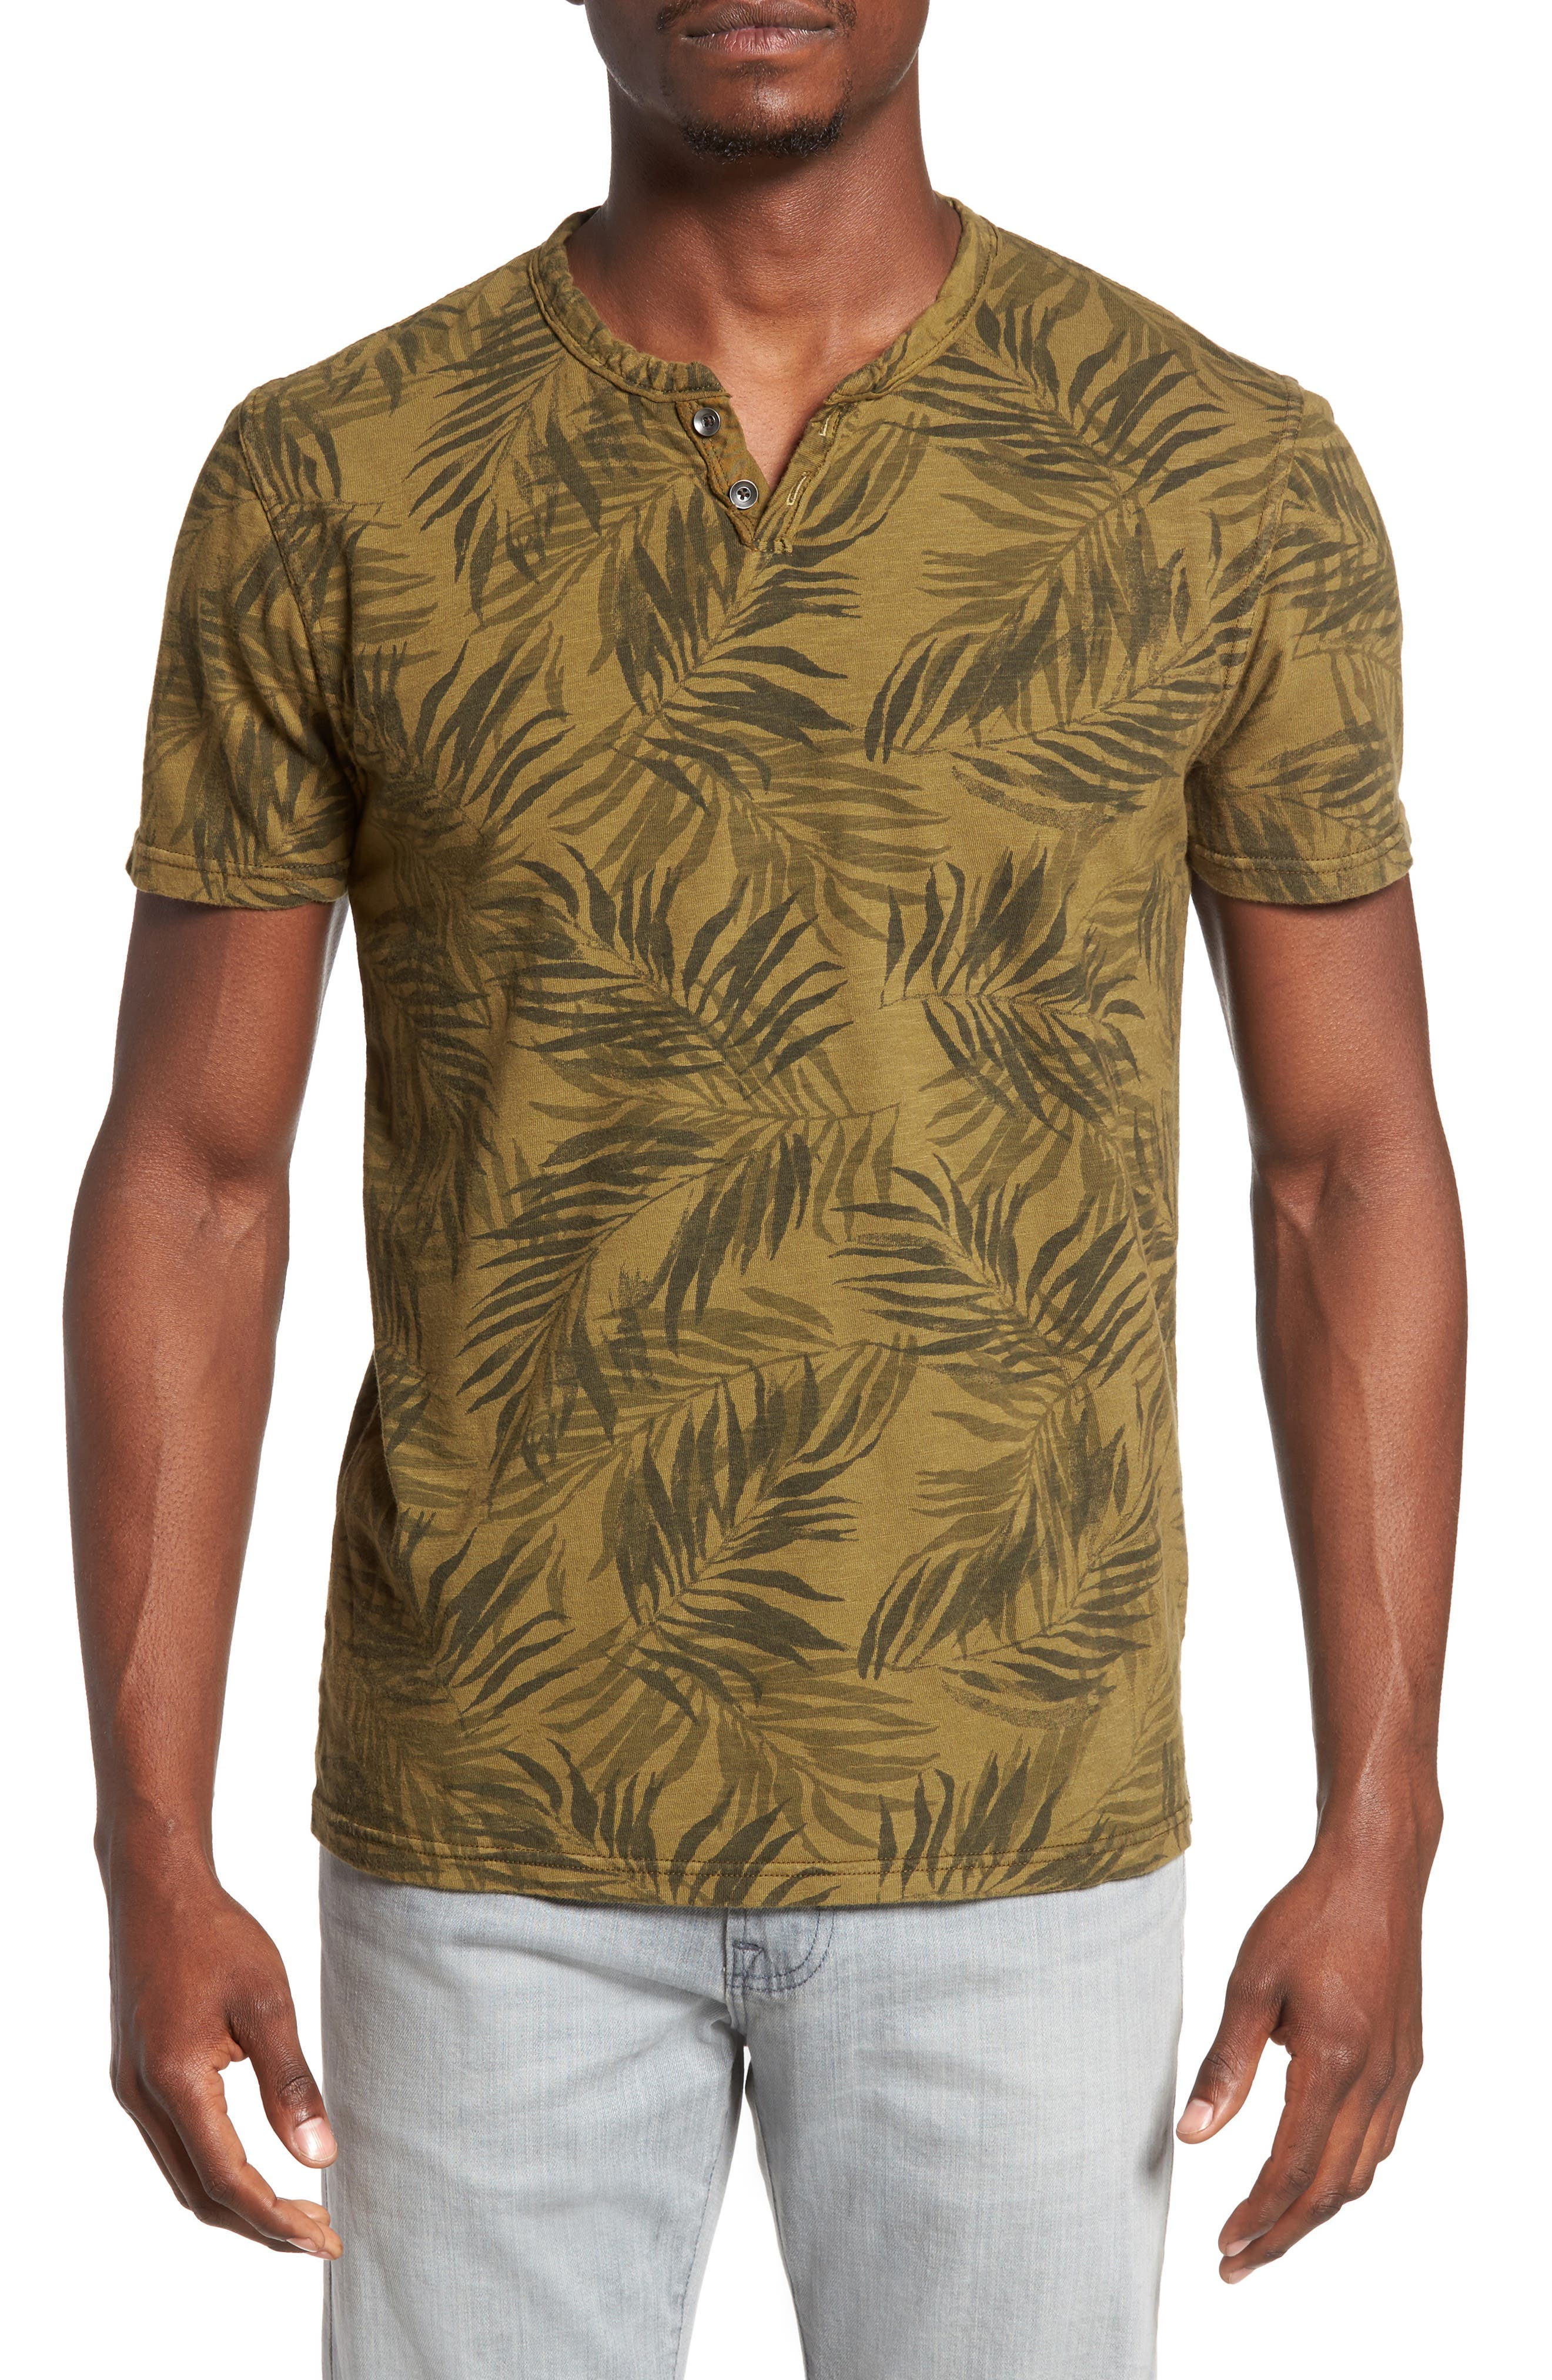 Alternate Image 1 Selected - Lucky Brand Palm Print Notch T-Shirt